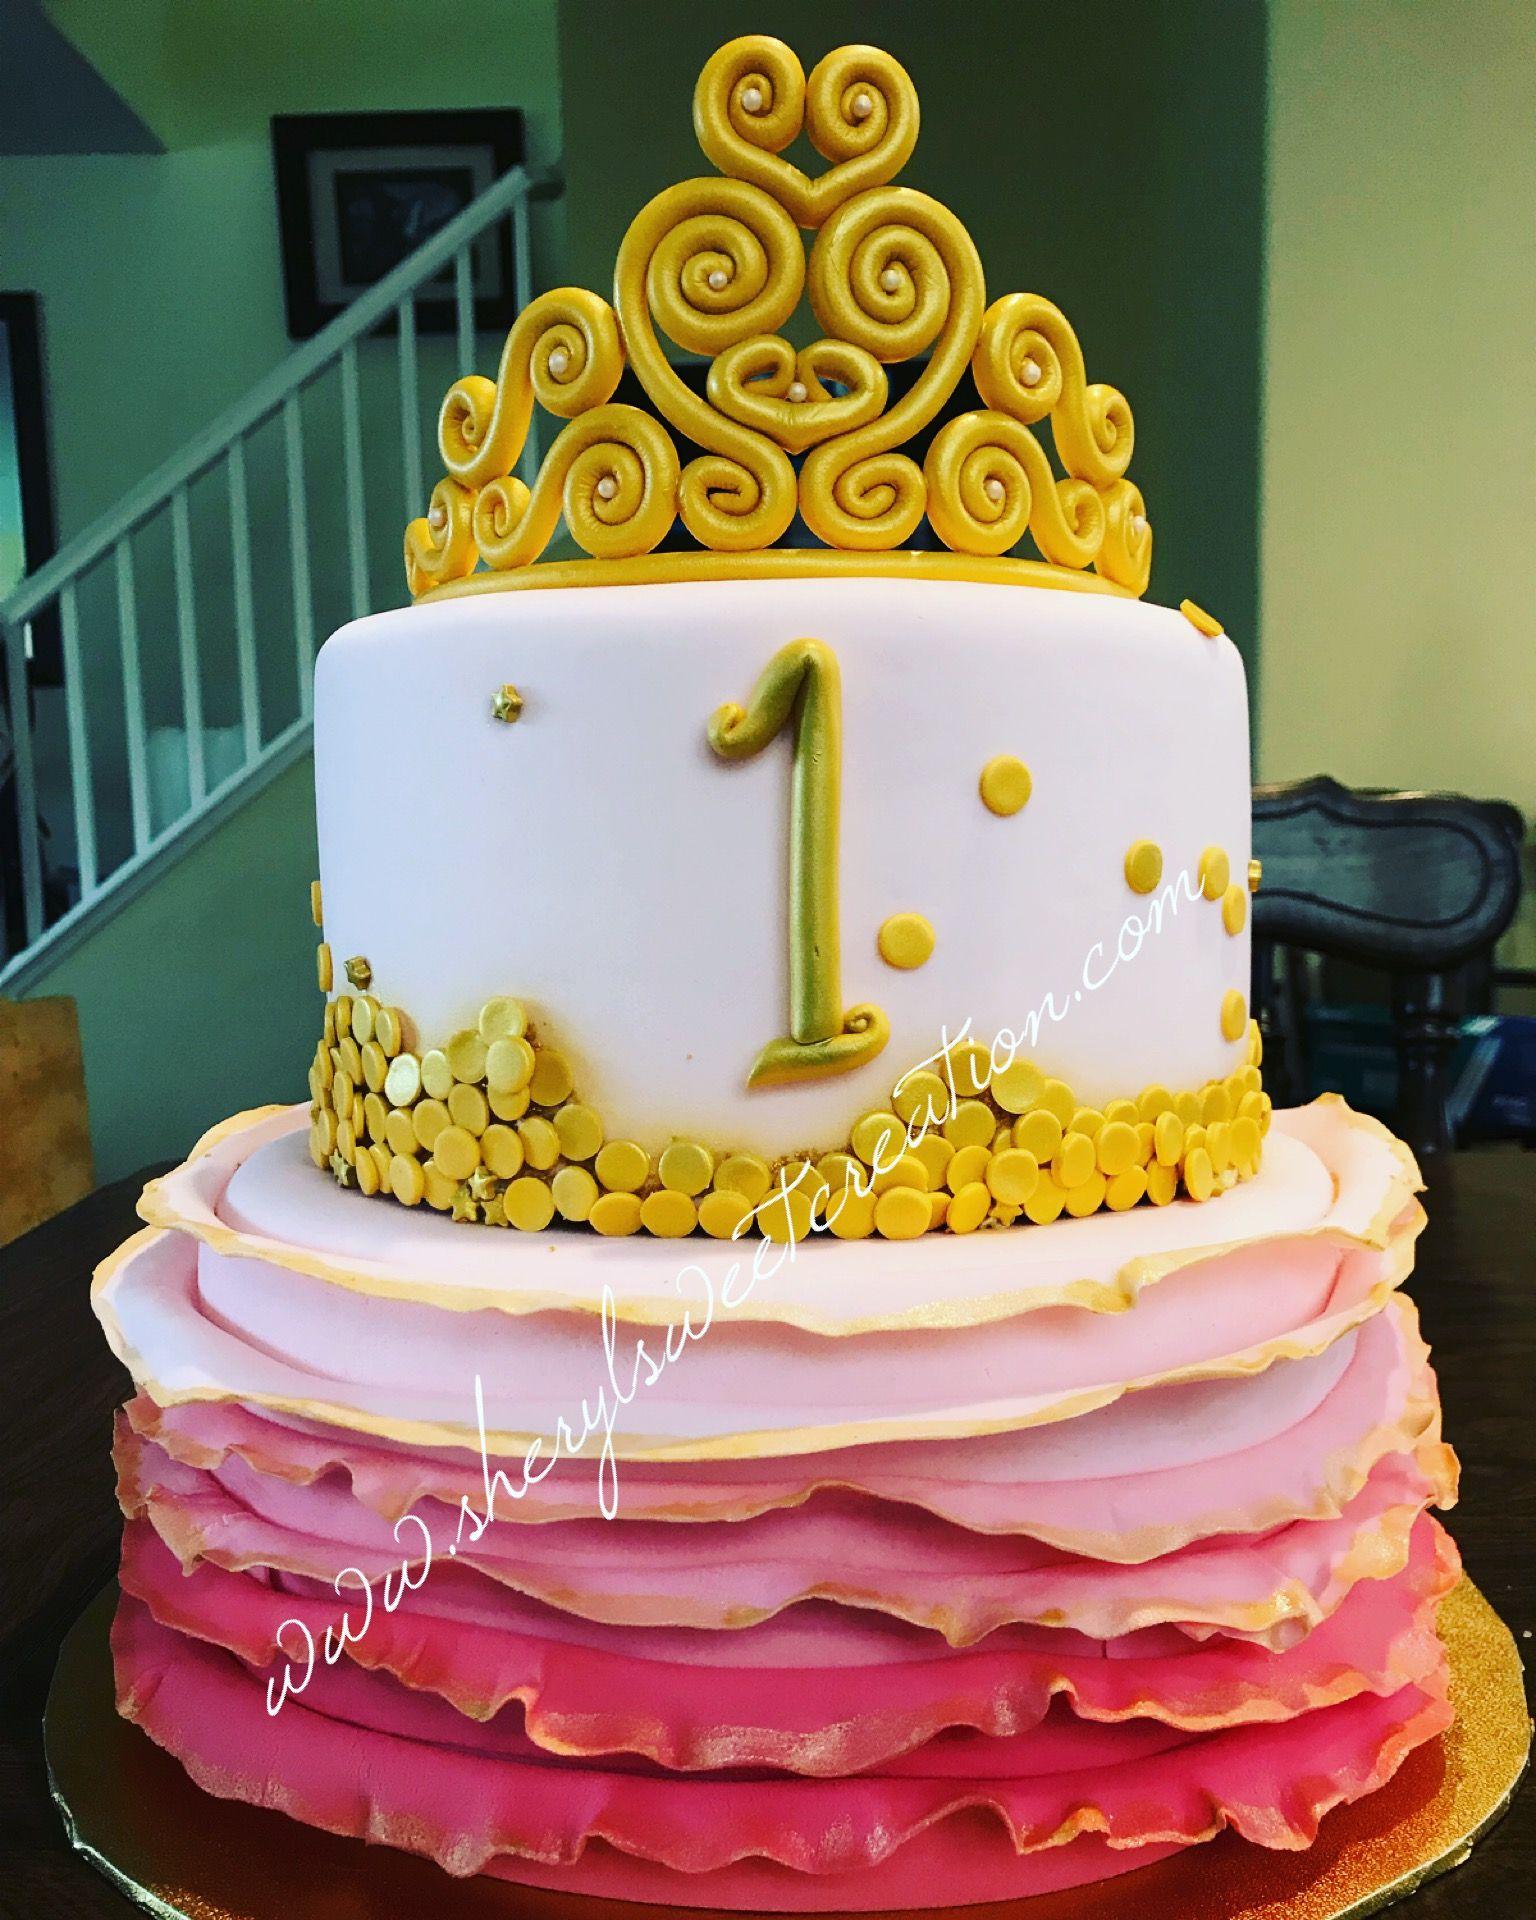 Pin by Brenda Terrell on dq cakes   Tiara cake, Cake, Desserts